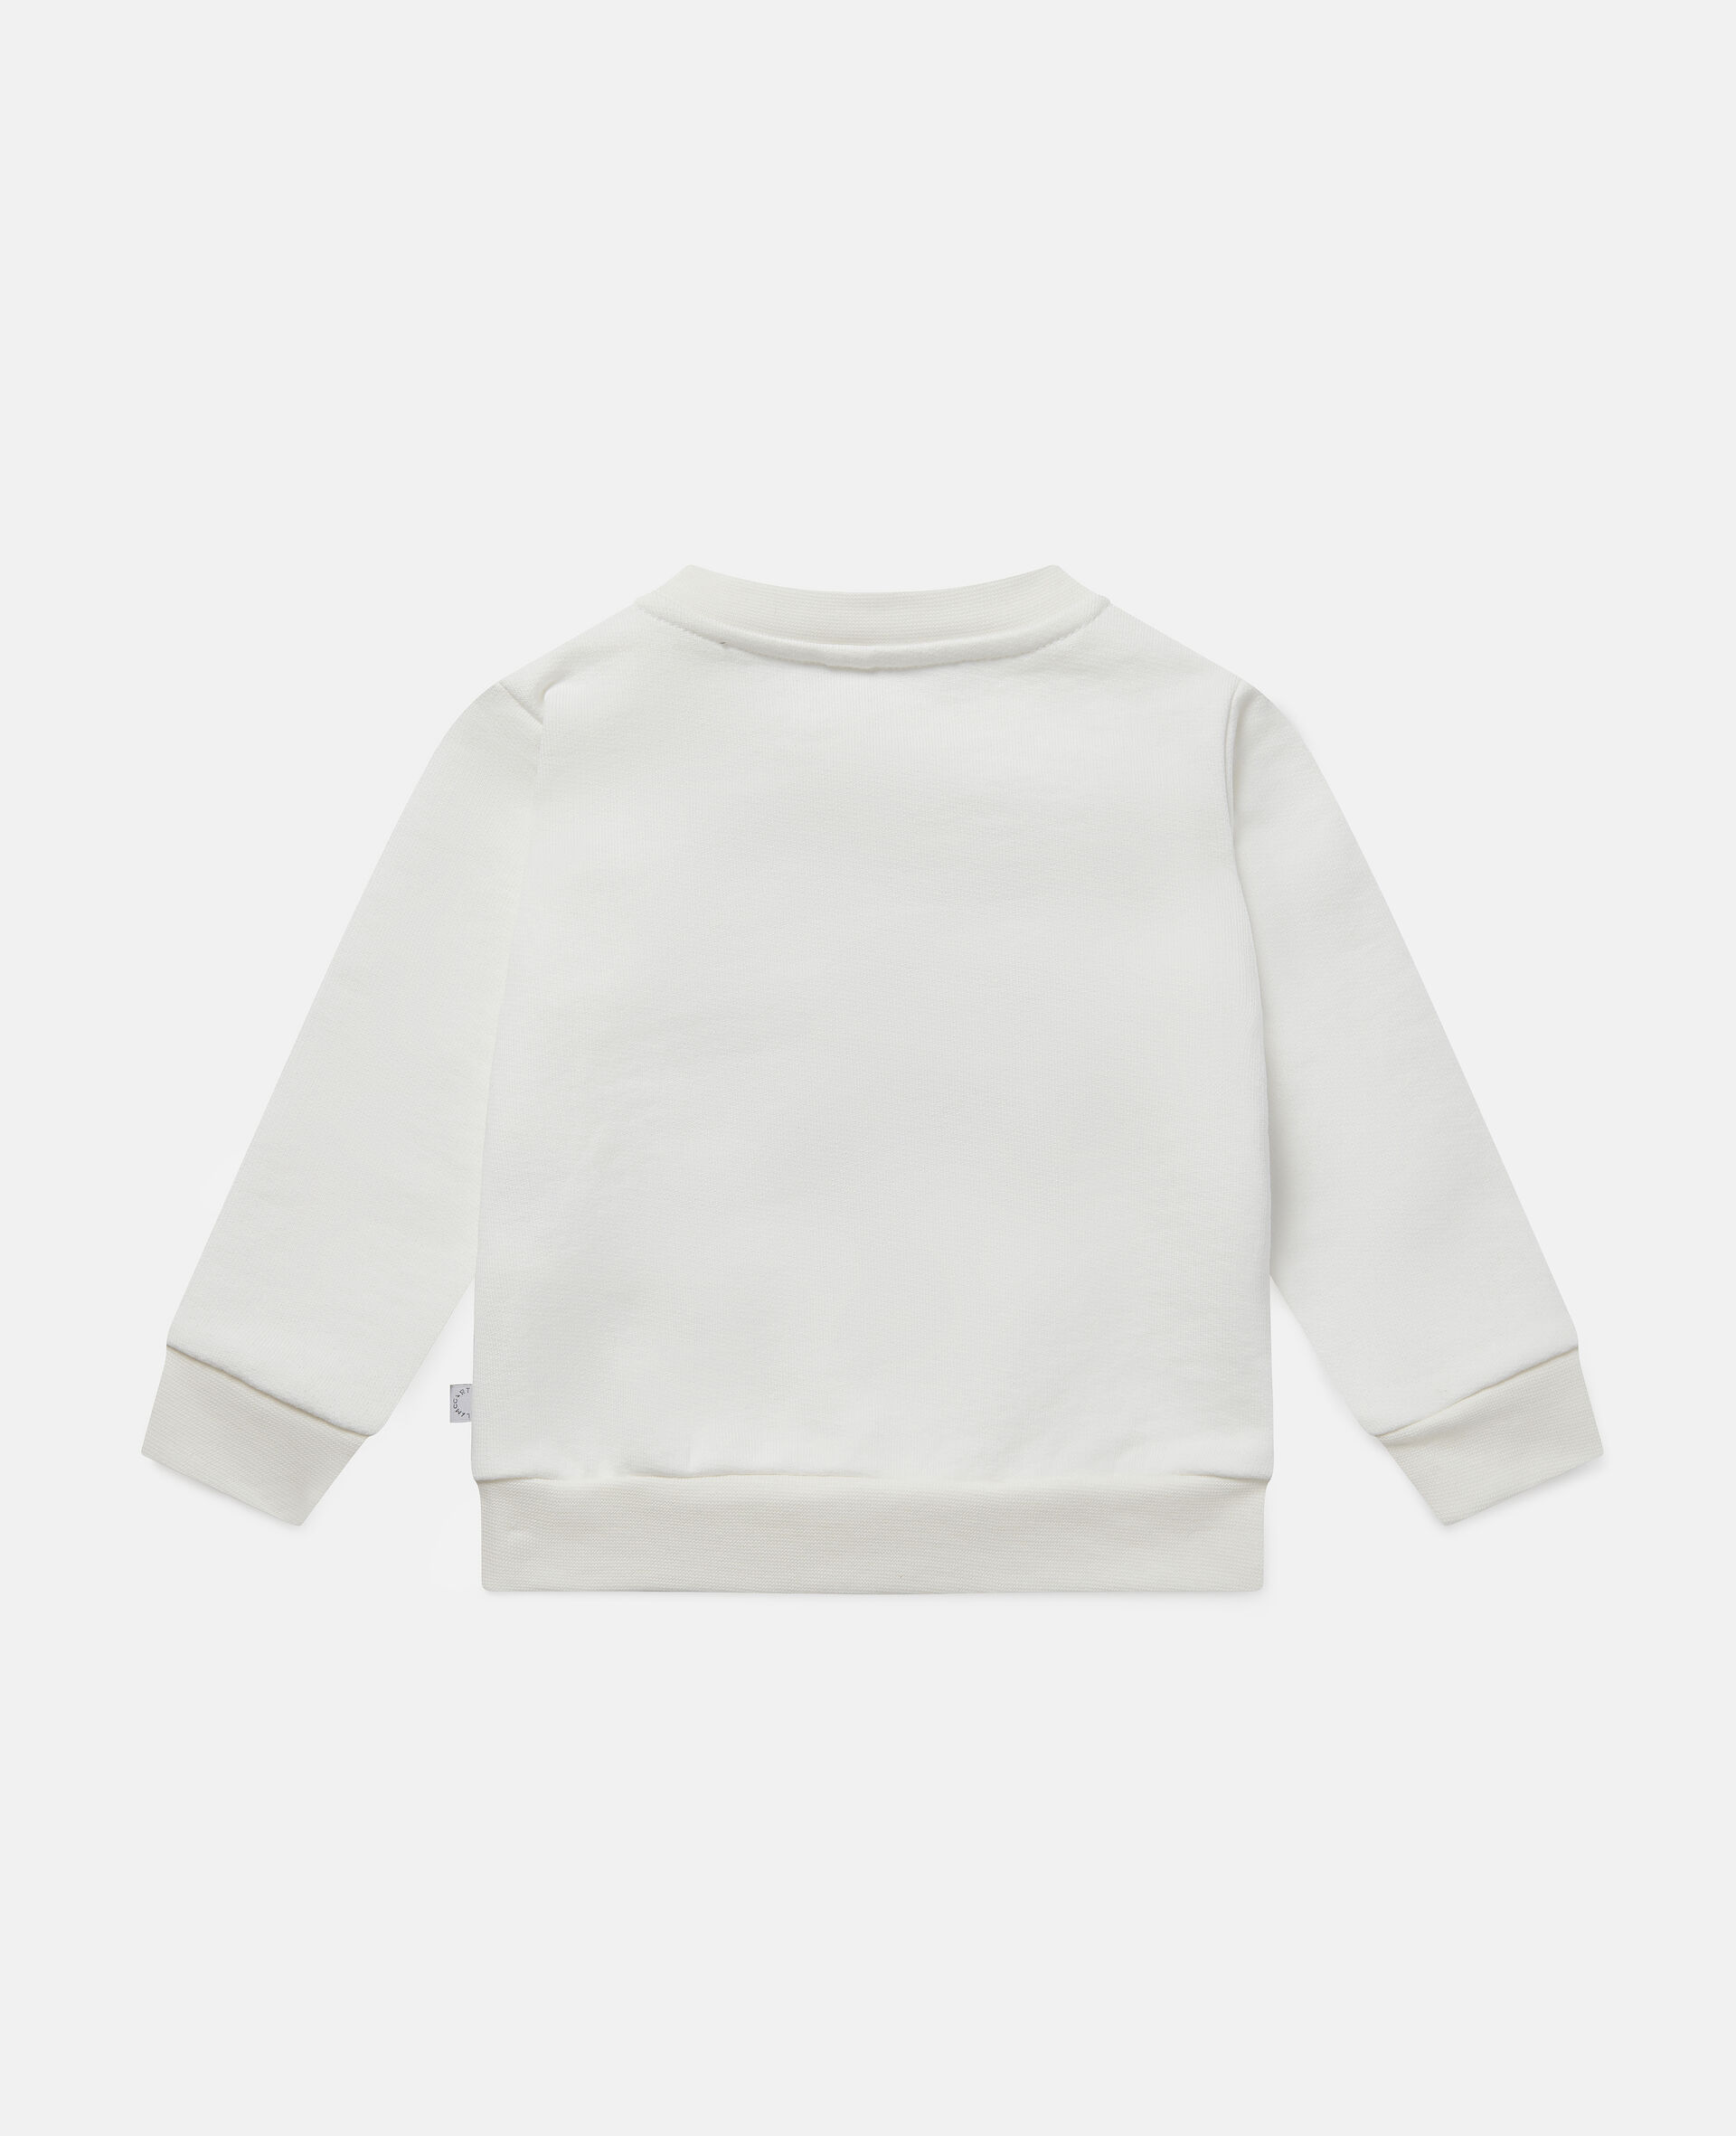 Daisy Heart Cotton Fleece Sweatshirt -White-large image number 3